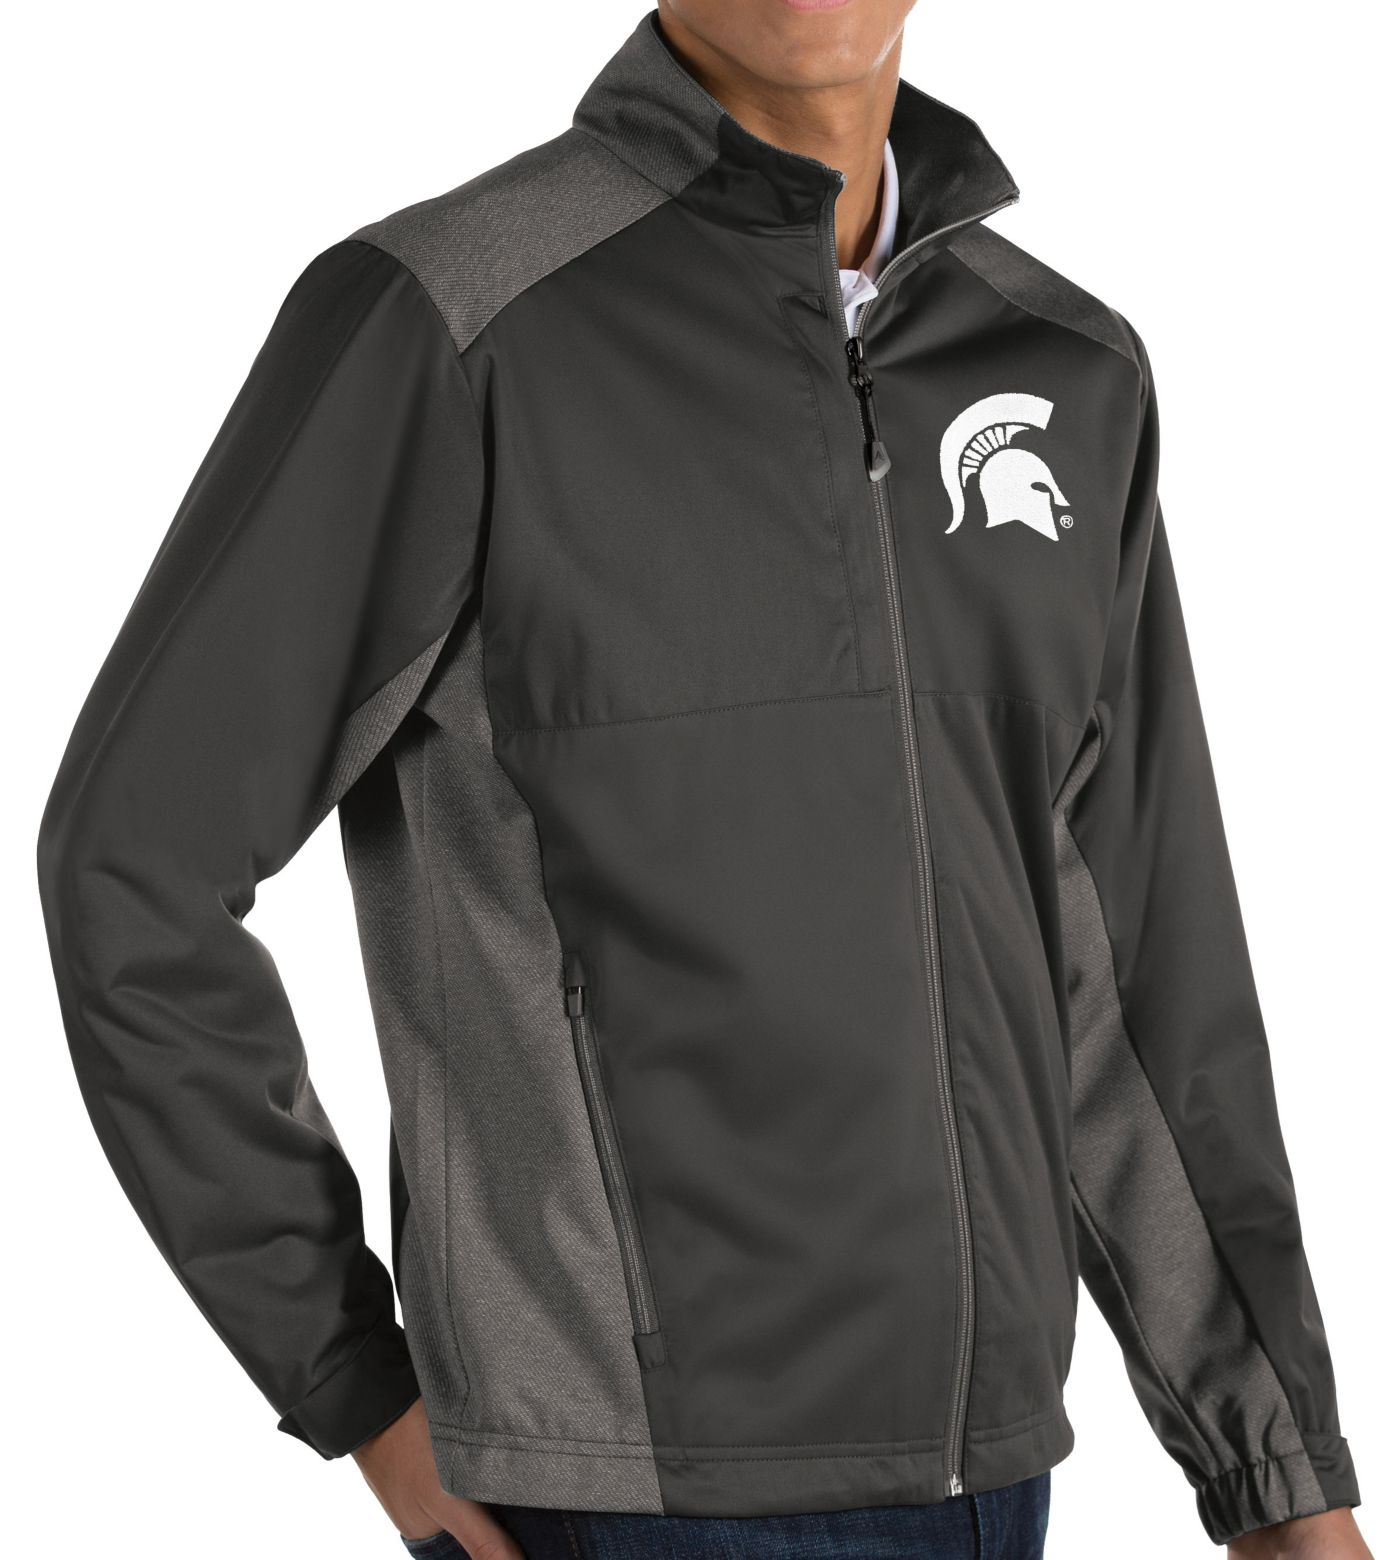 Antigua Men's Michigan State Spartans Grey Revolve Full-Zip Jacket